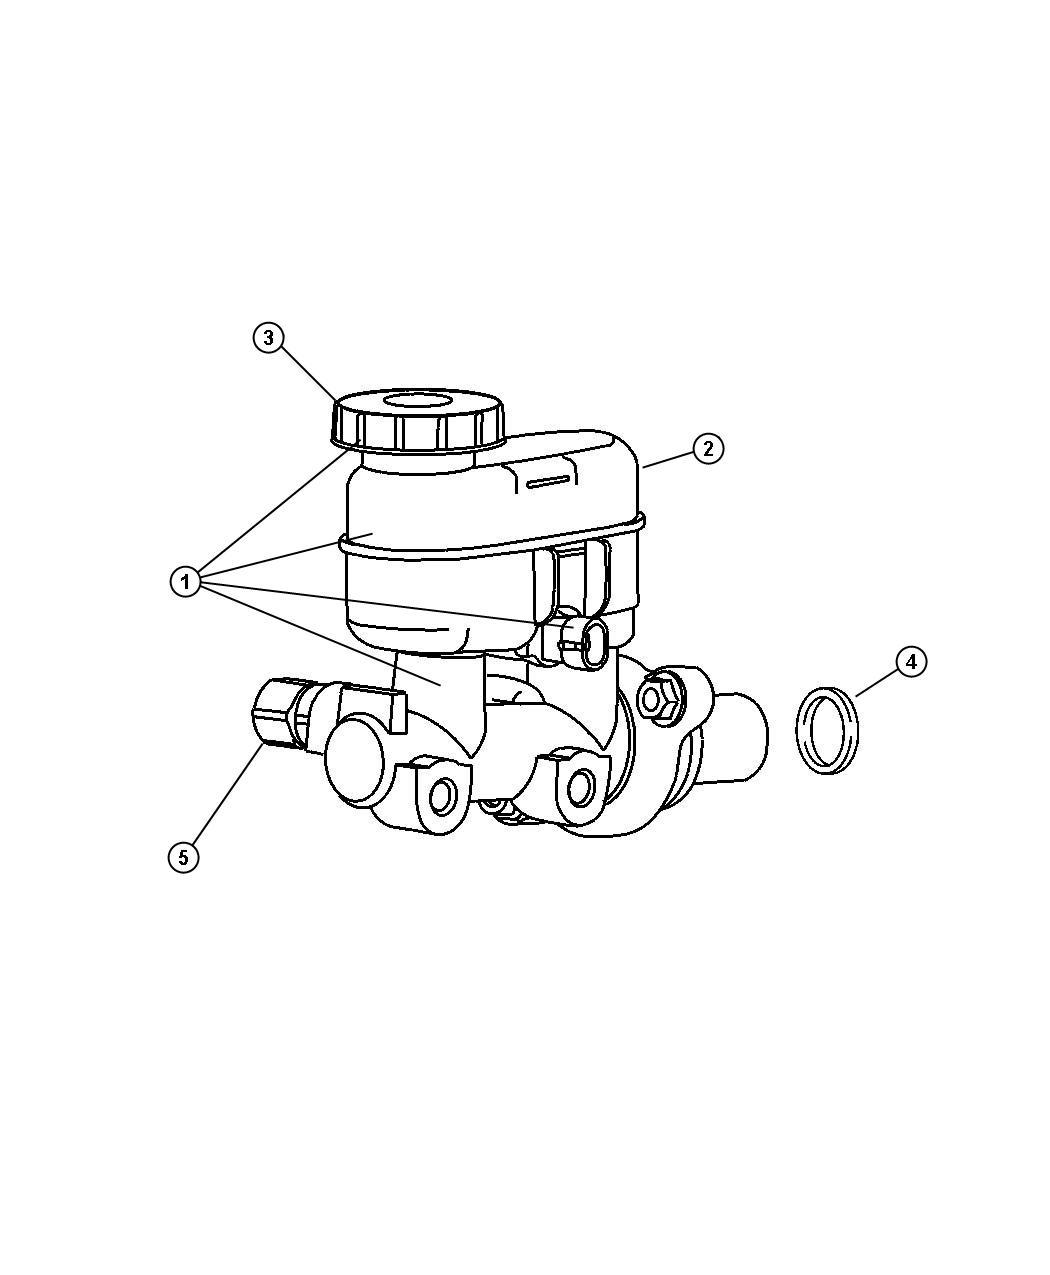 Dodge Neon Valve Proportioning Brakes Front Drum